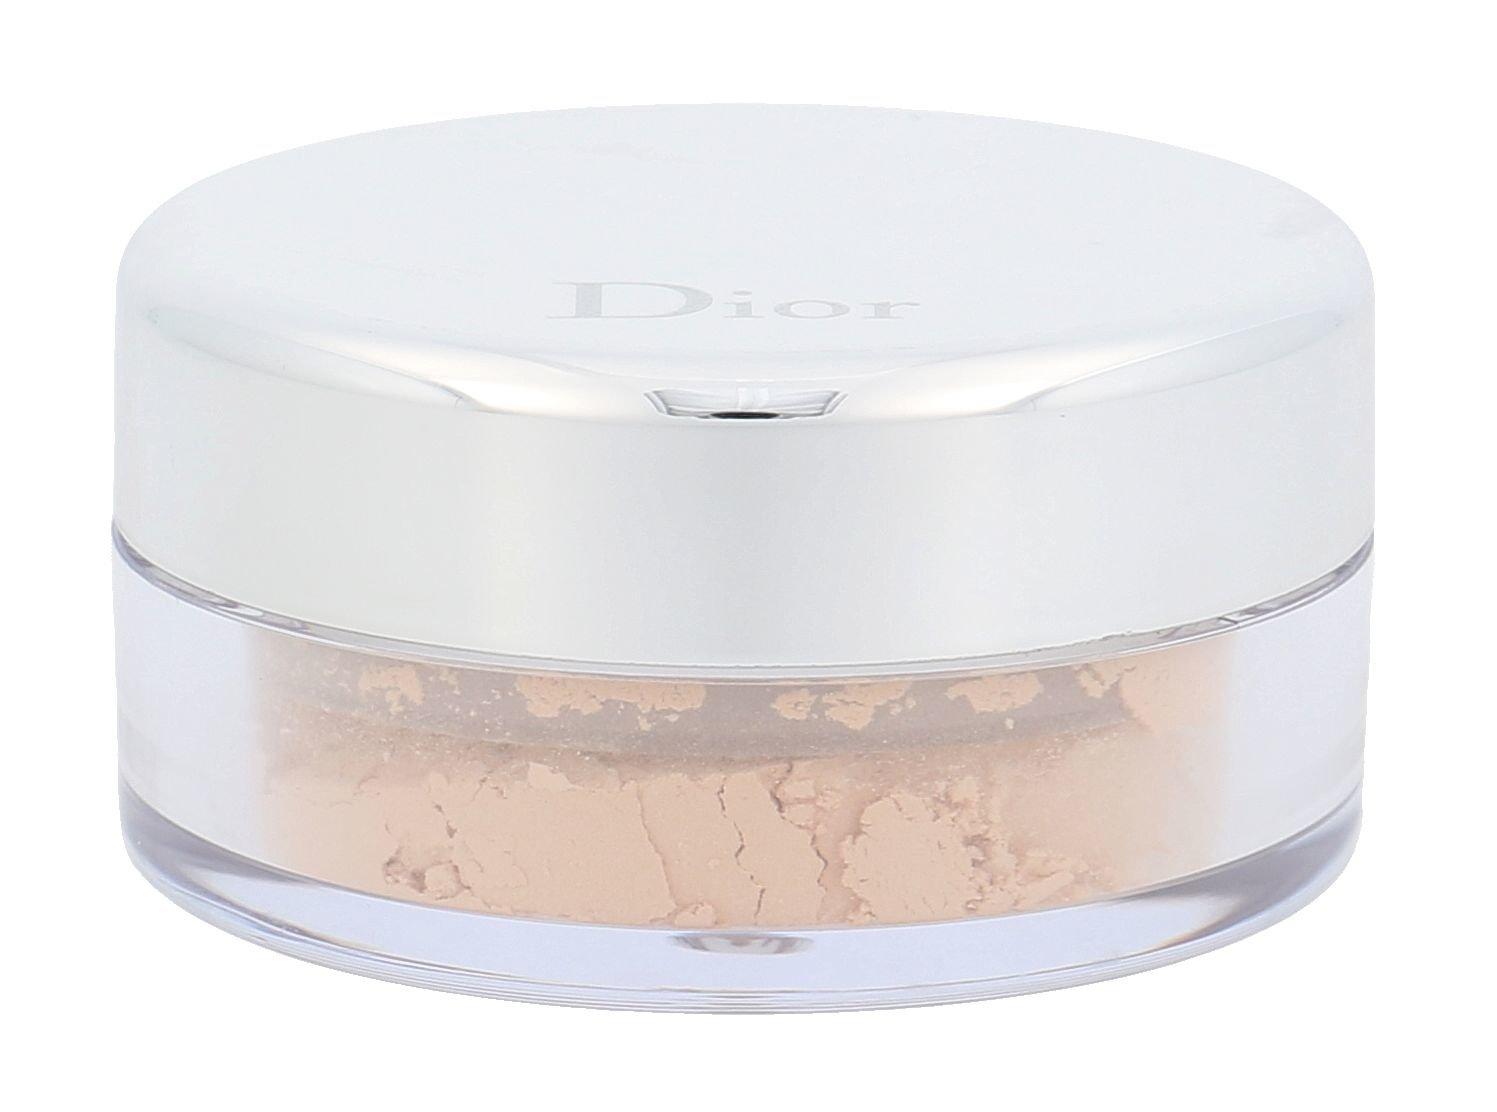 Christian Dior Diorskin Nude Cosmetic 2,2ml 020 Light Beige